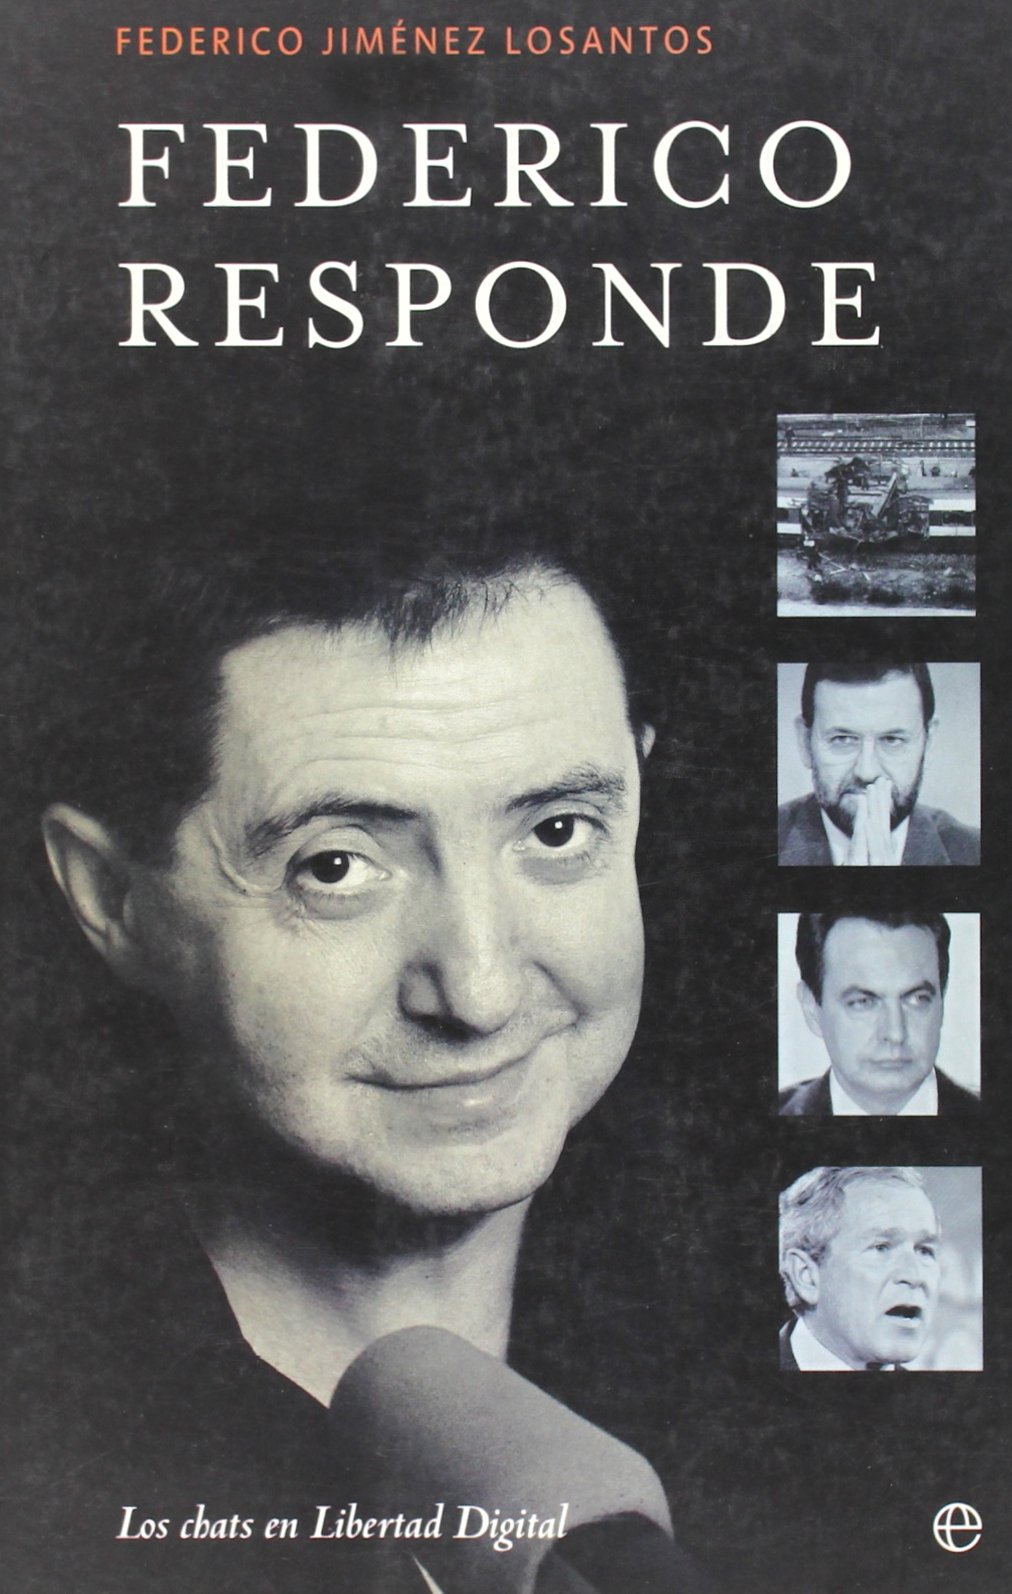 Federico responde: Amazon.es: Jimenez Losantos, F.: Libros